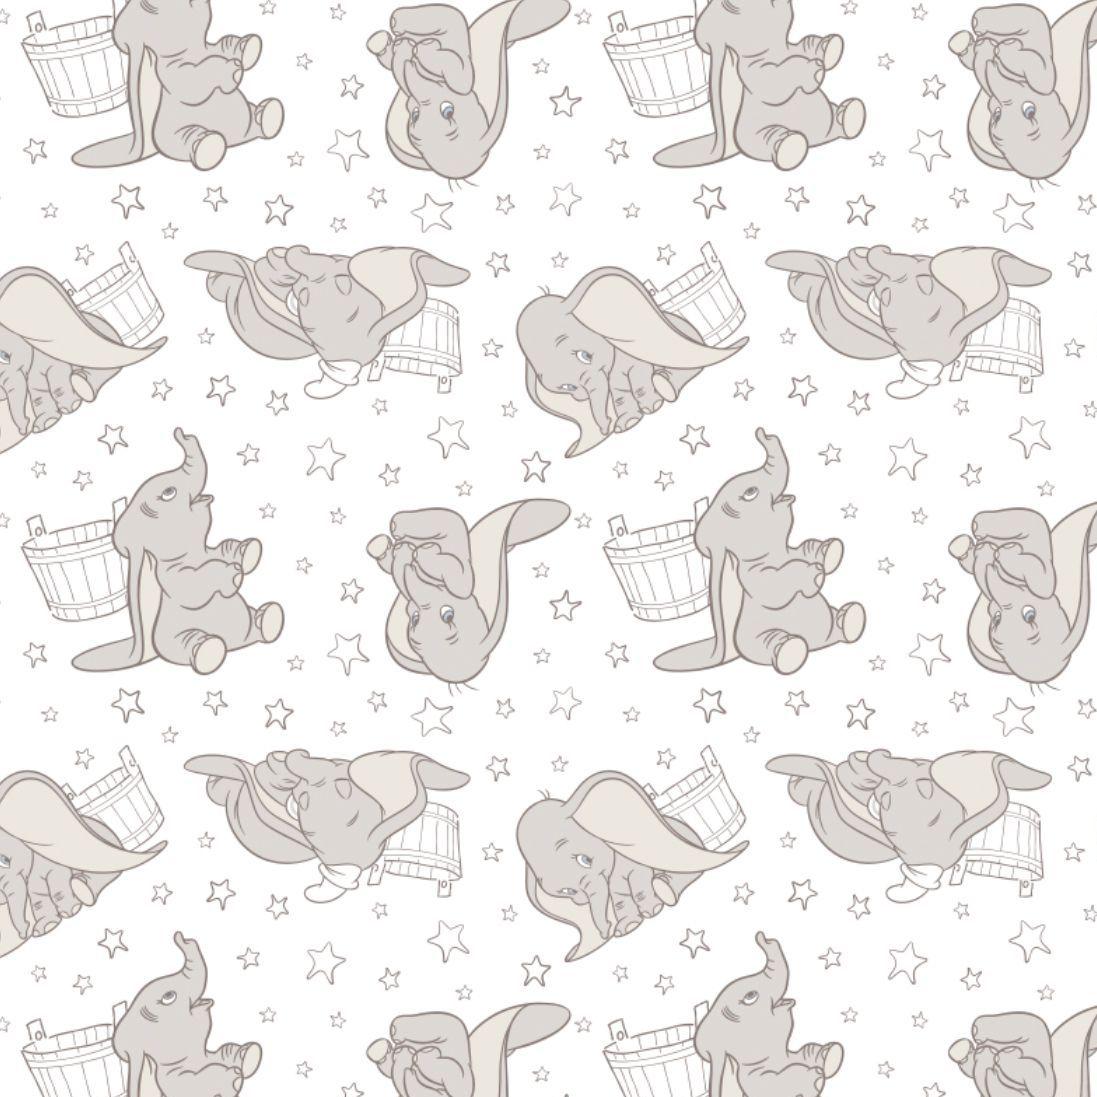 Disney Classics Dumbo Stars in Dark Taupe Sketch Low Volume Baby Elephant N